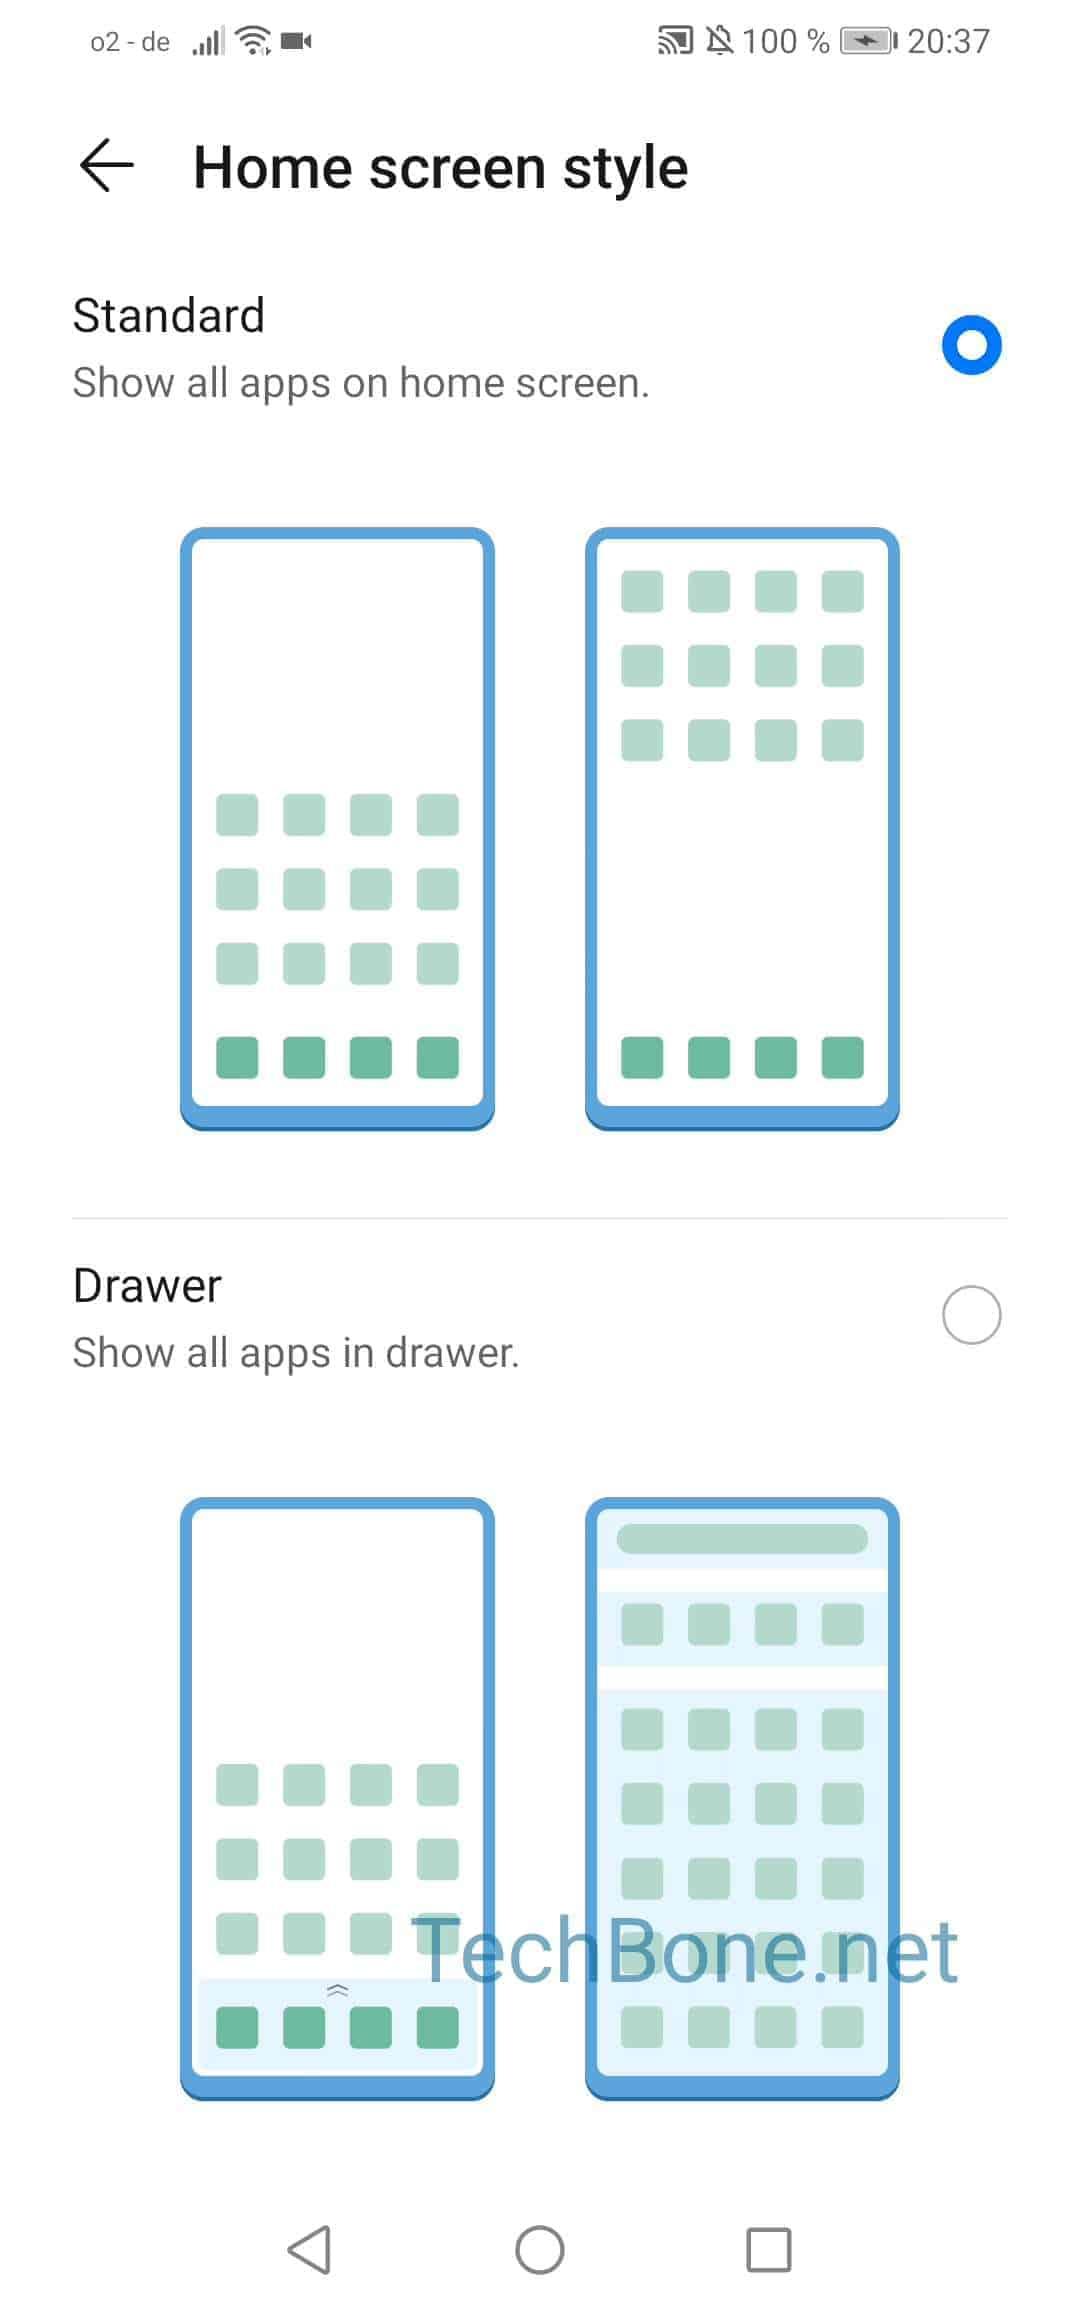 Step 4: Choose Standard or Drawer